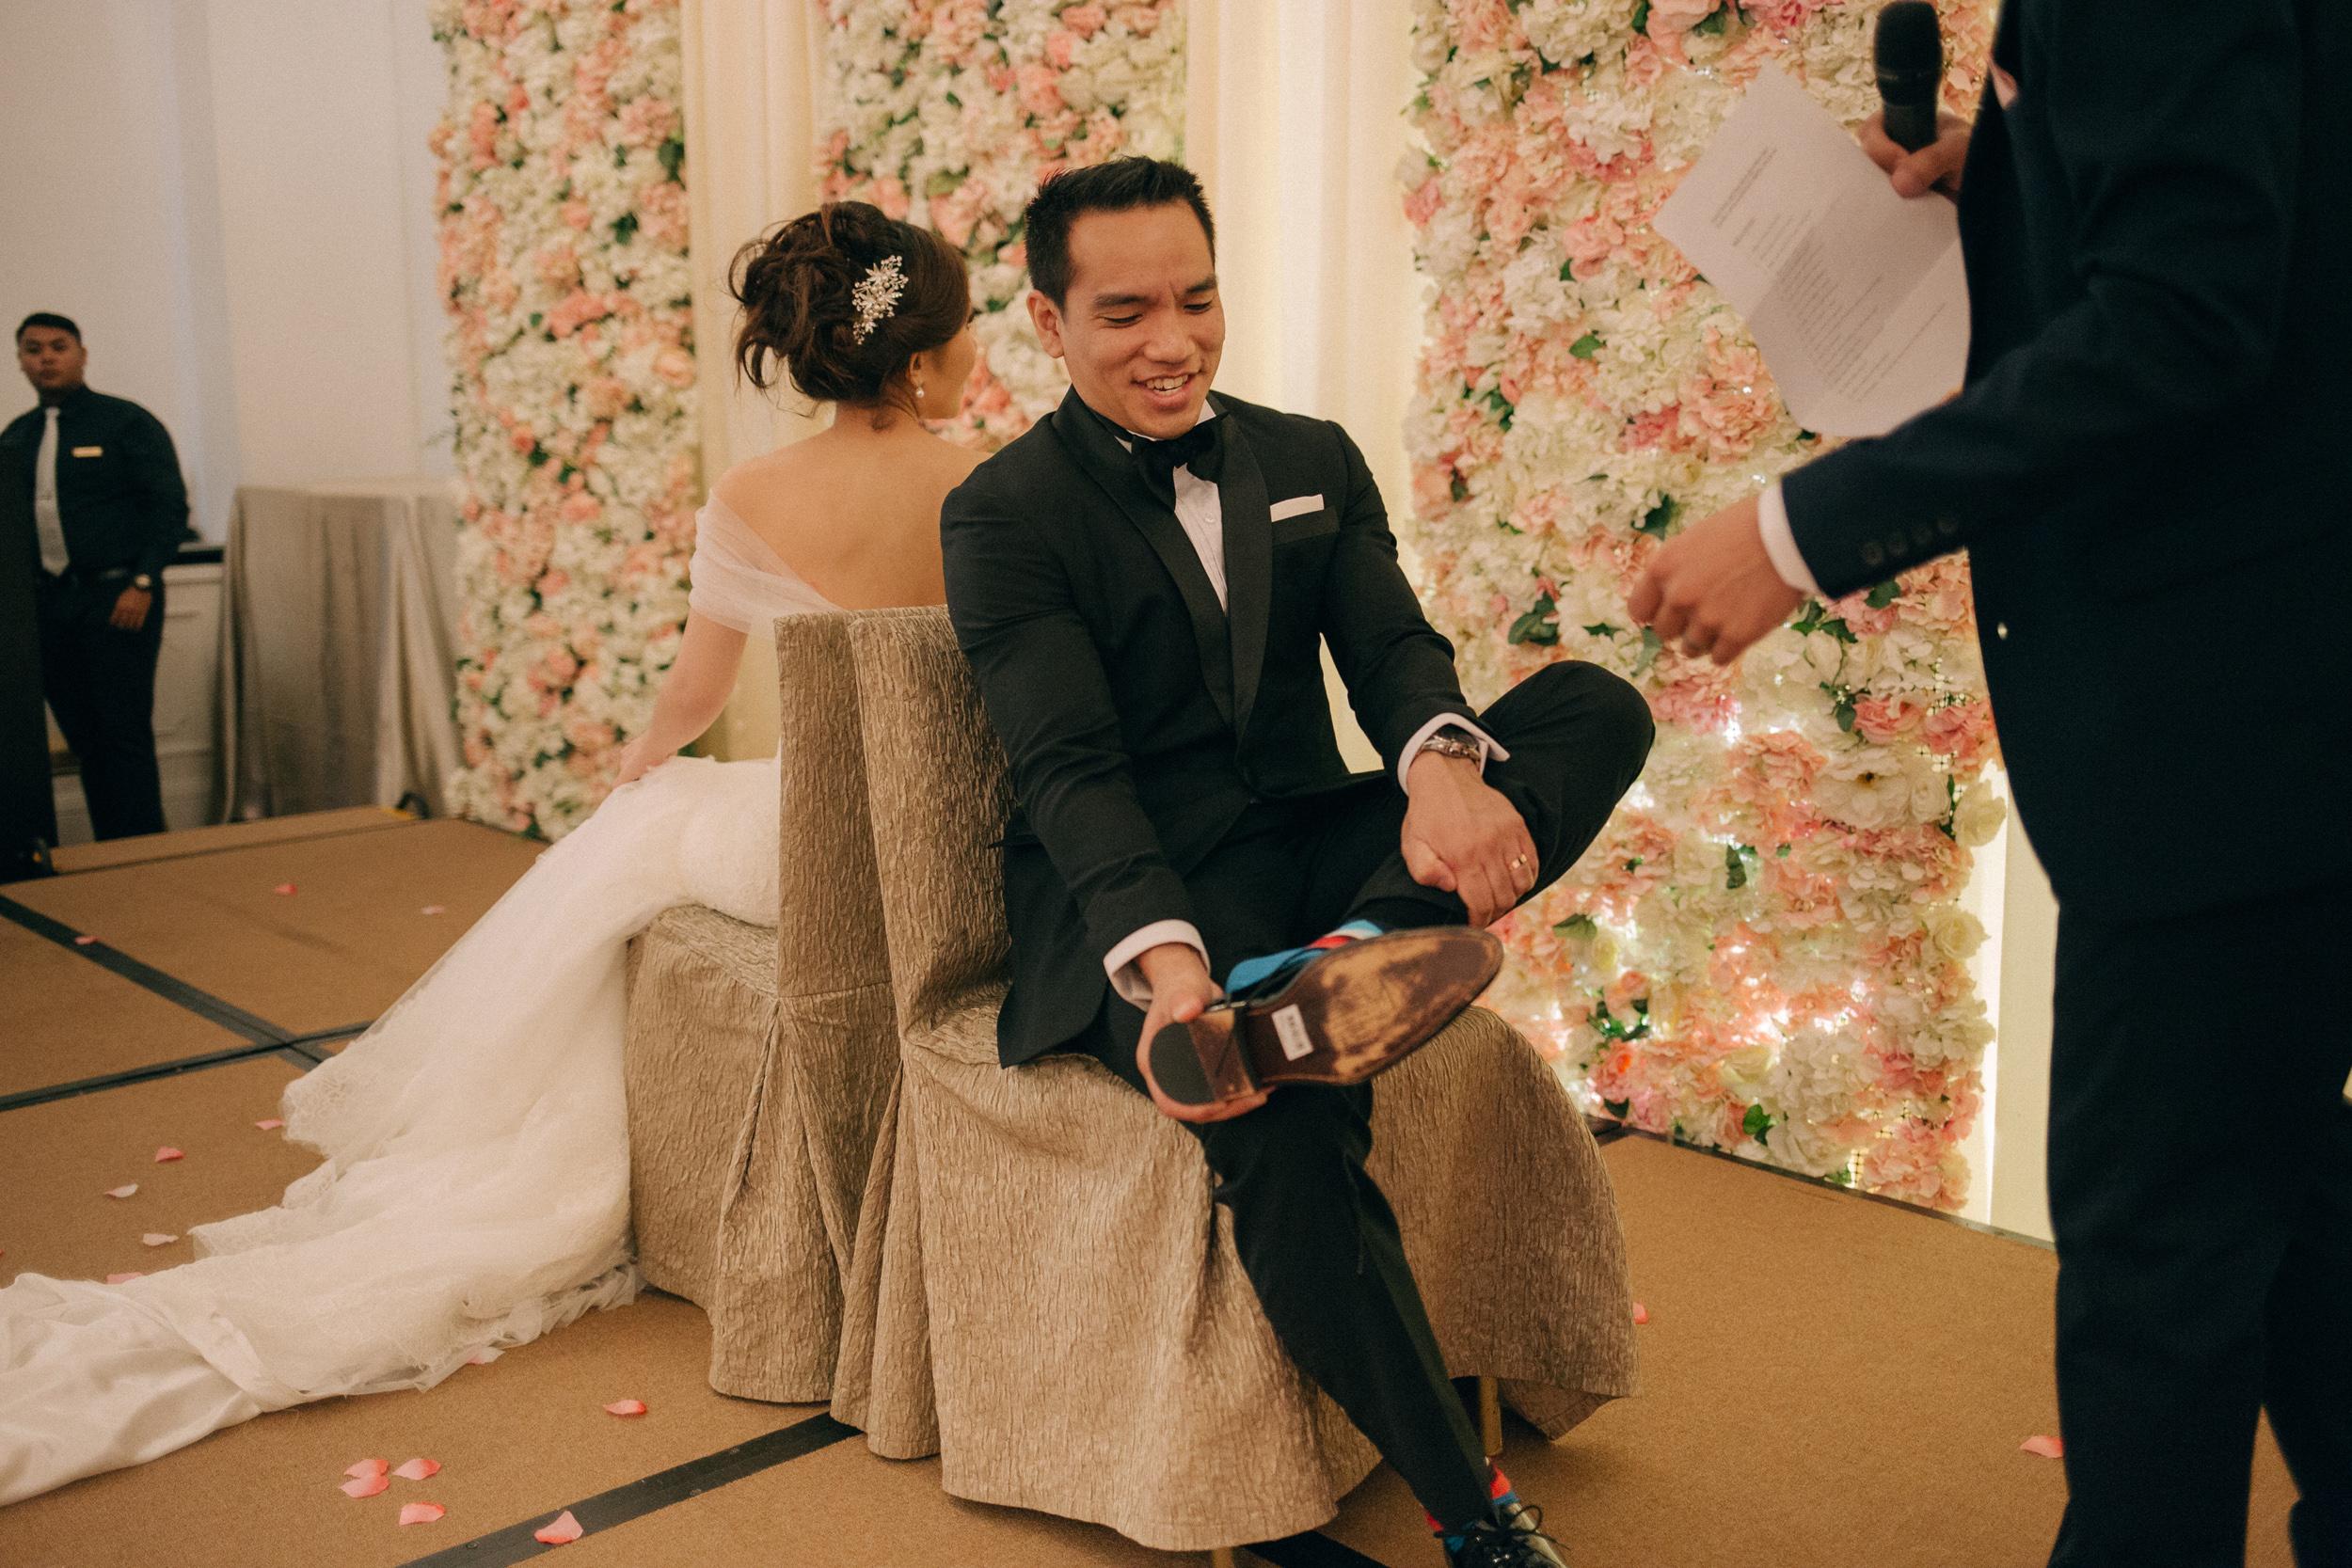 singapore-wedding-photographer-cheryl-matthew-fullerton-hotel-wedding-69.jpg